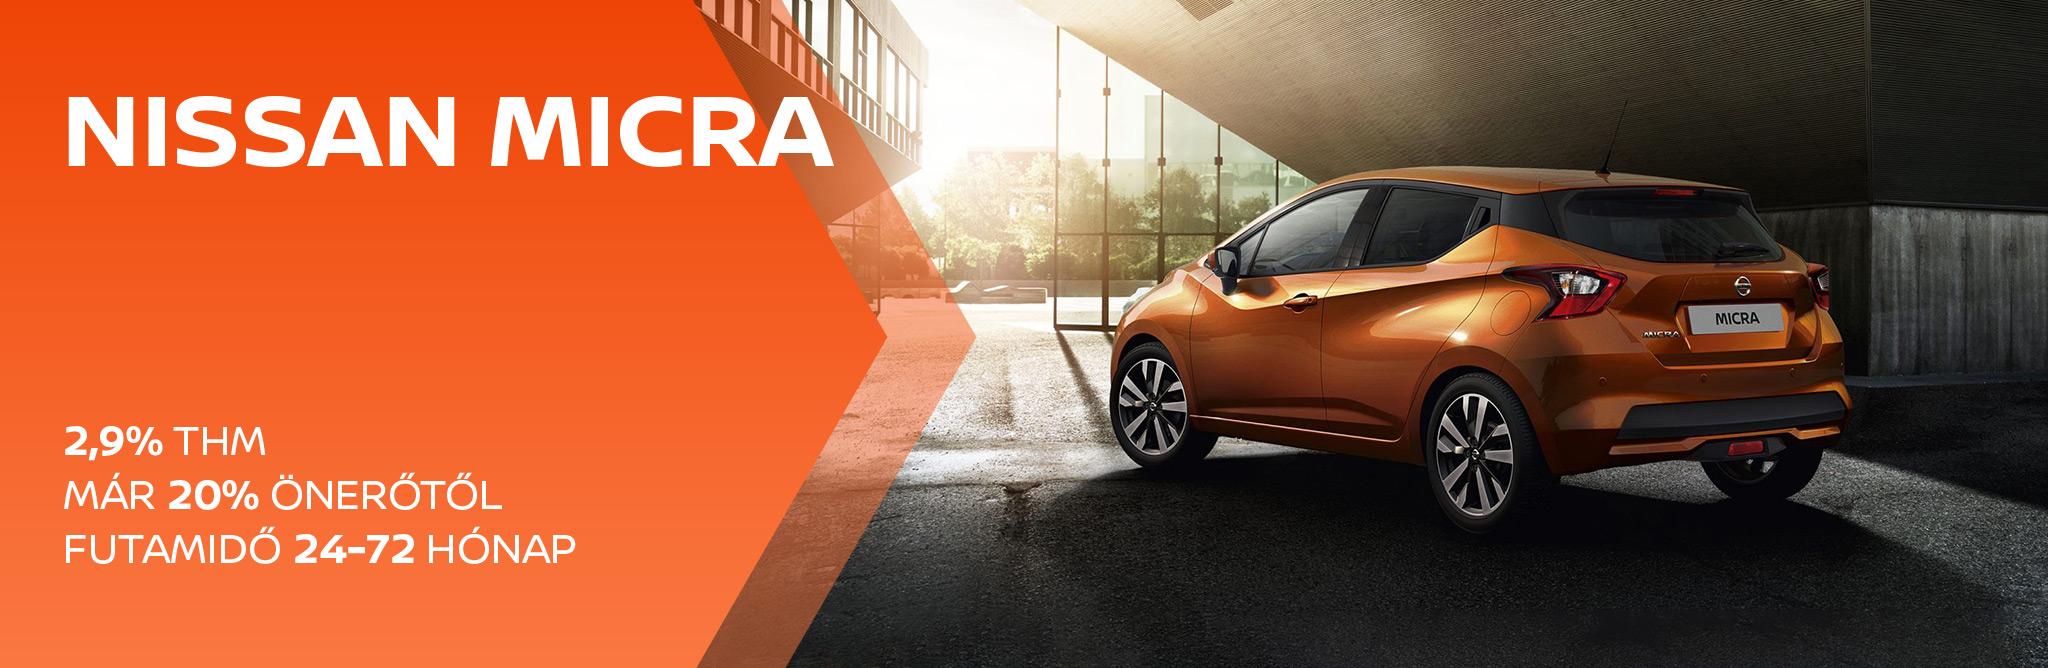 Nissan Micra 2,9% THM